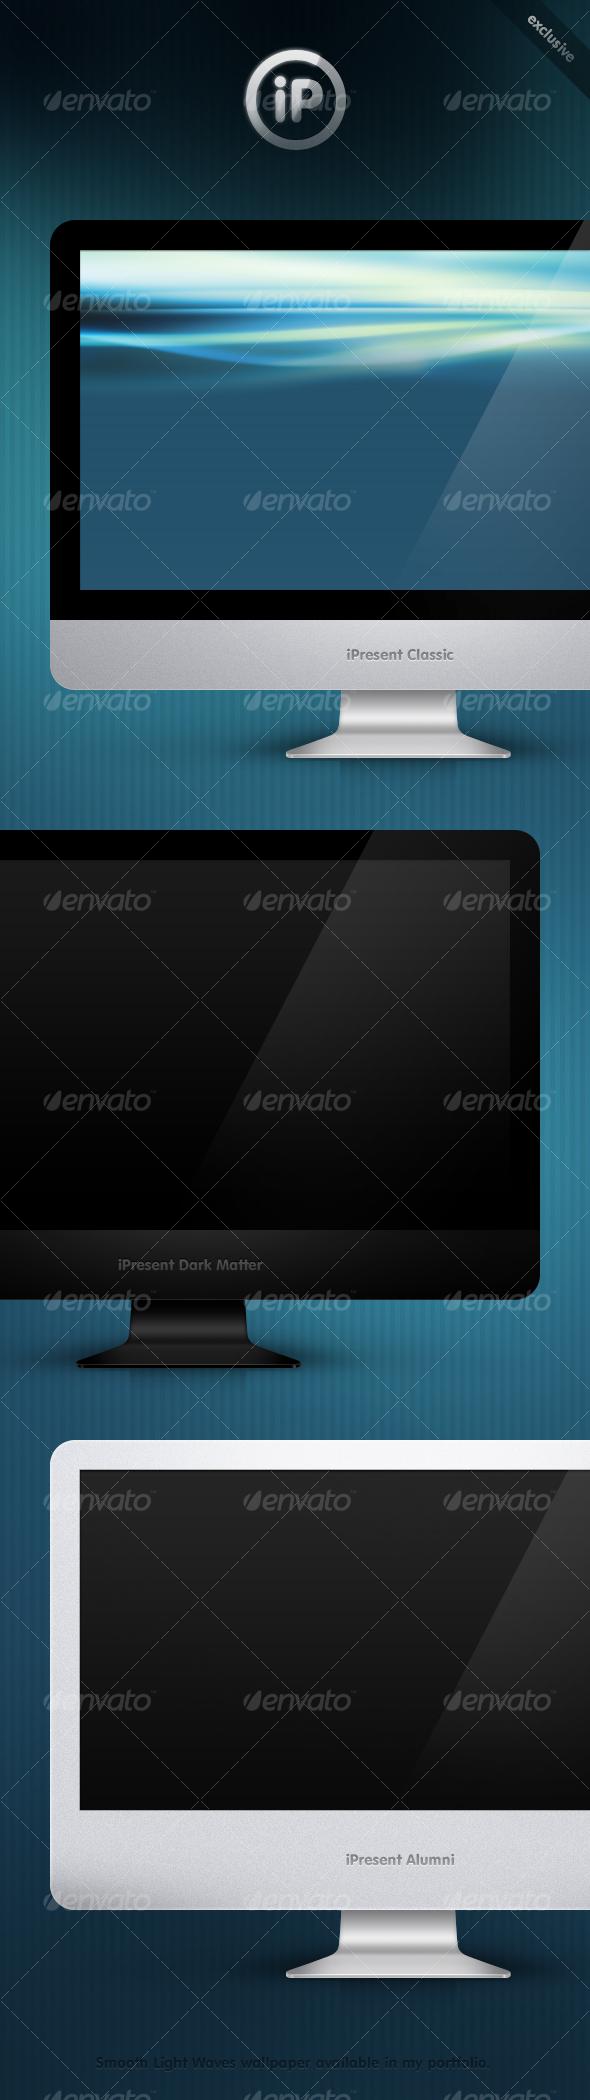 iPresent - Monitors Displays